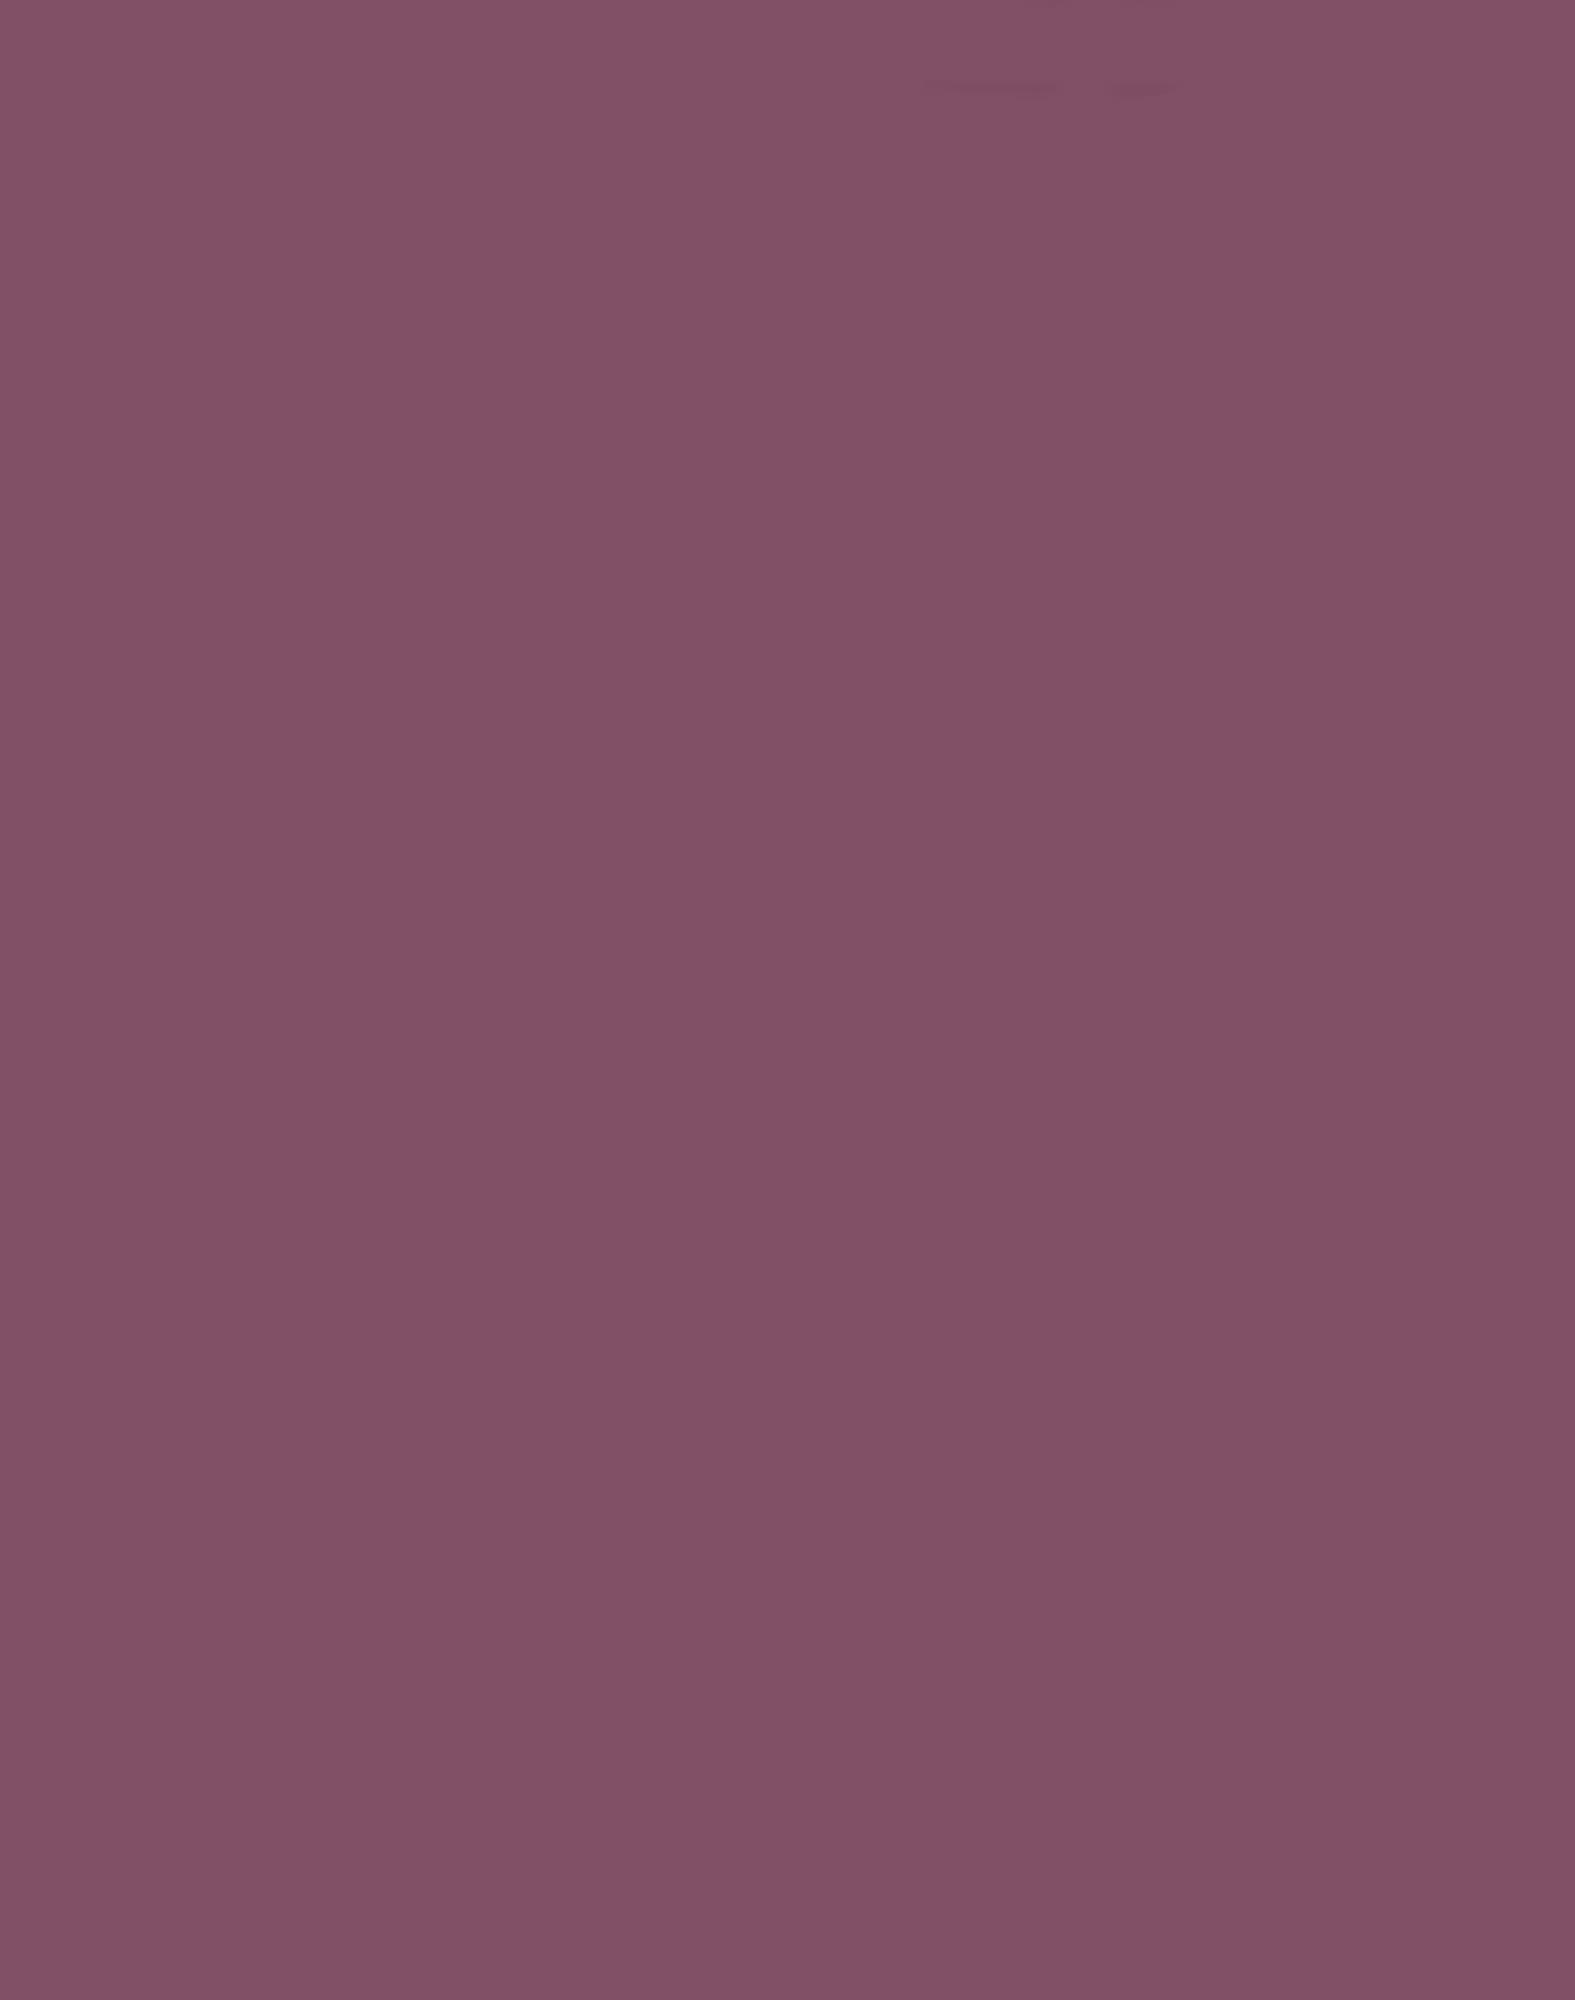 Deep Amethyst 129,79,102